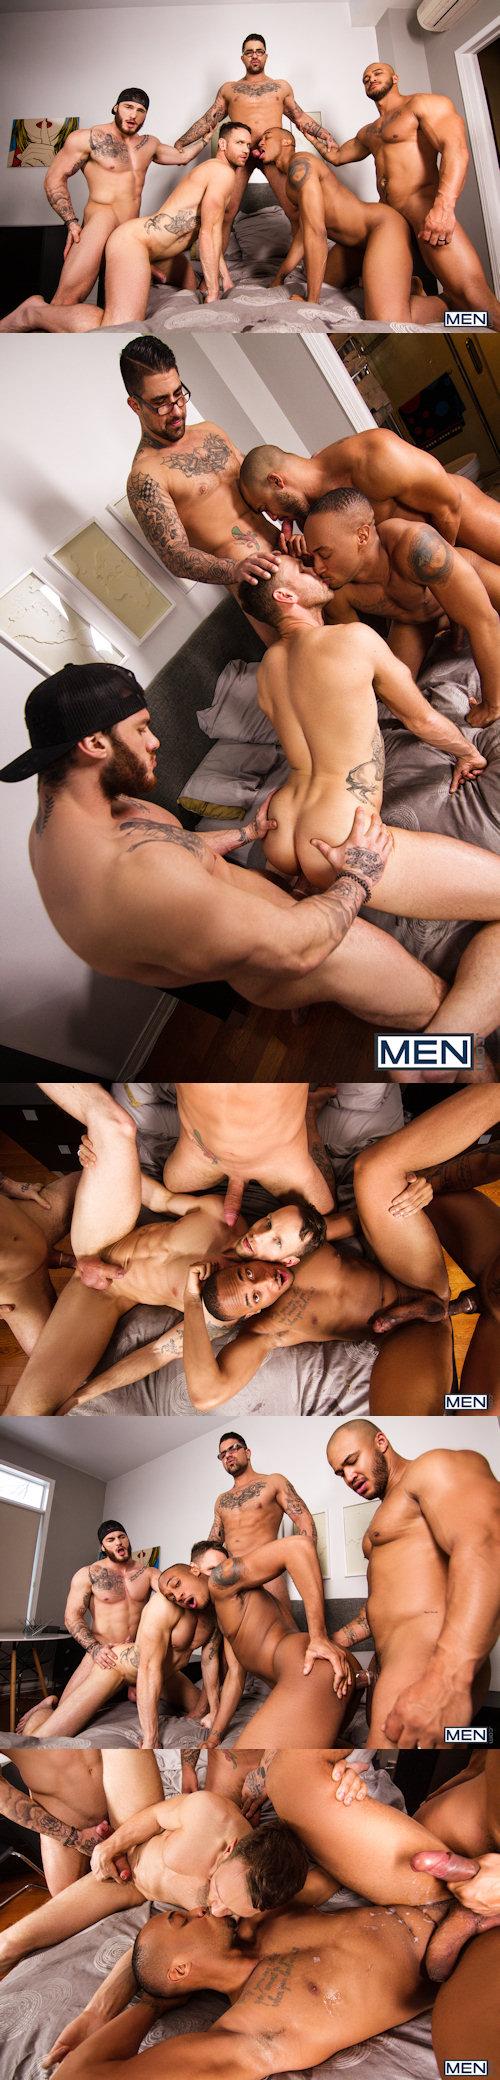 men-by-invitation-only-2.jpg